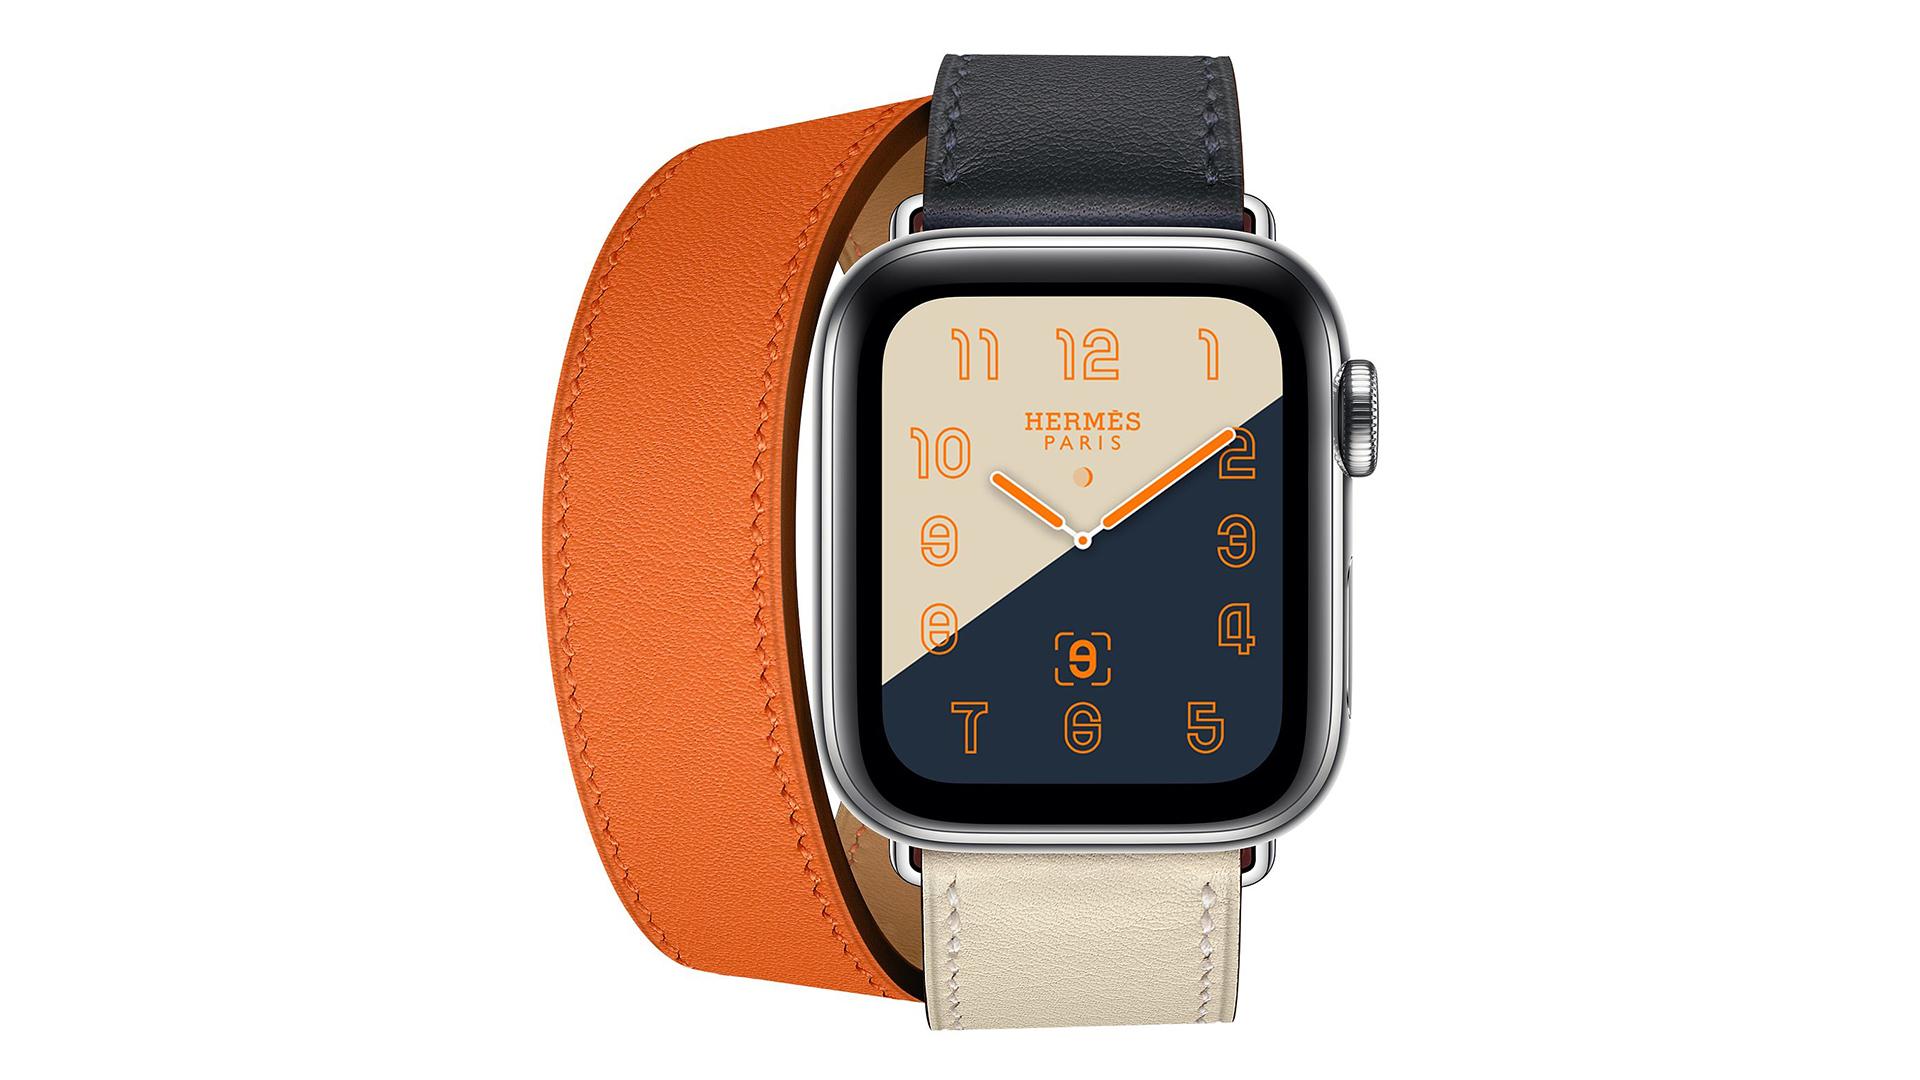 Apple Watch Hermesを買いました 購入に至った経緯 特別な箱 バンド ファーストインプレッションを紹介 ガジェットショット